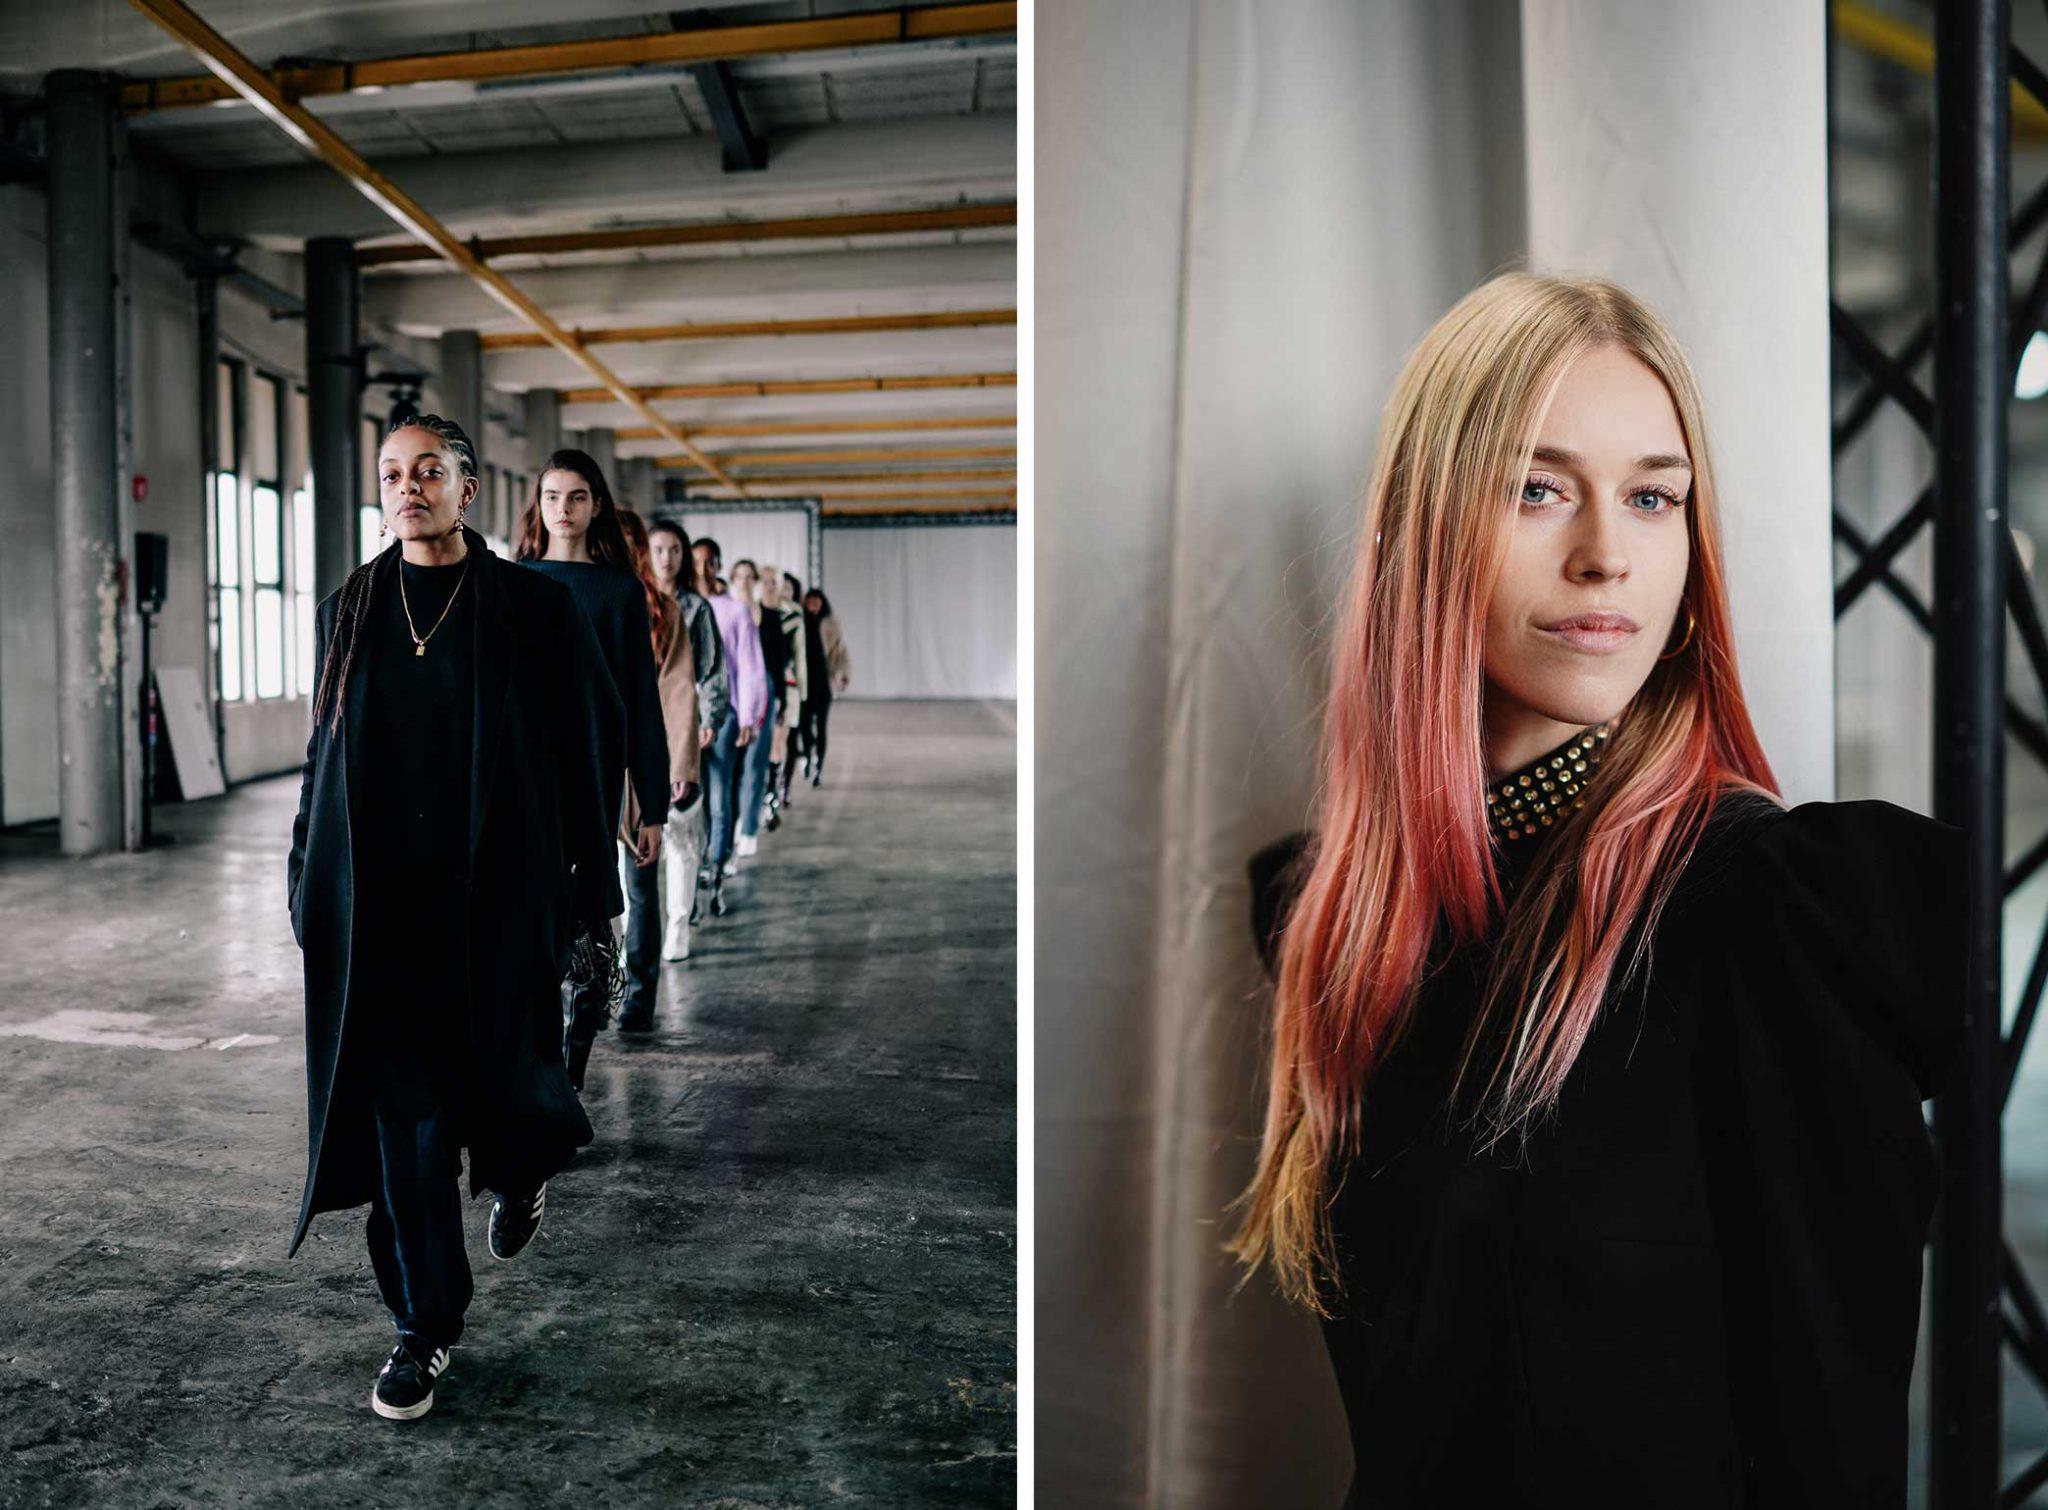 Ilsoo_van_Dijk_Ilsoovandijk_AFW_Toral_Backstage_Amsterdam_Fashion_week_2020_-scaled_4